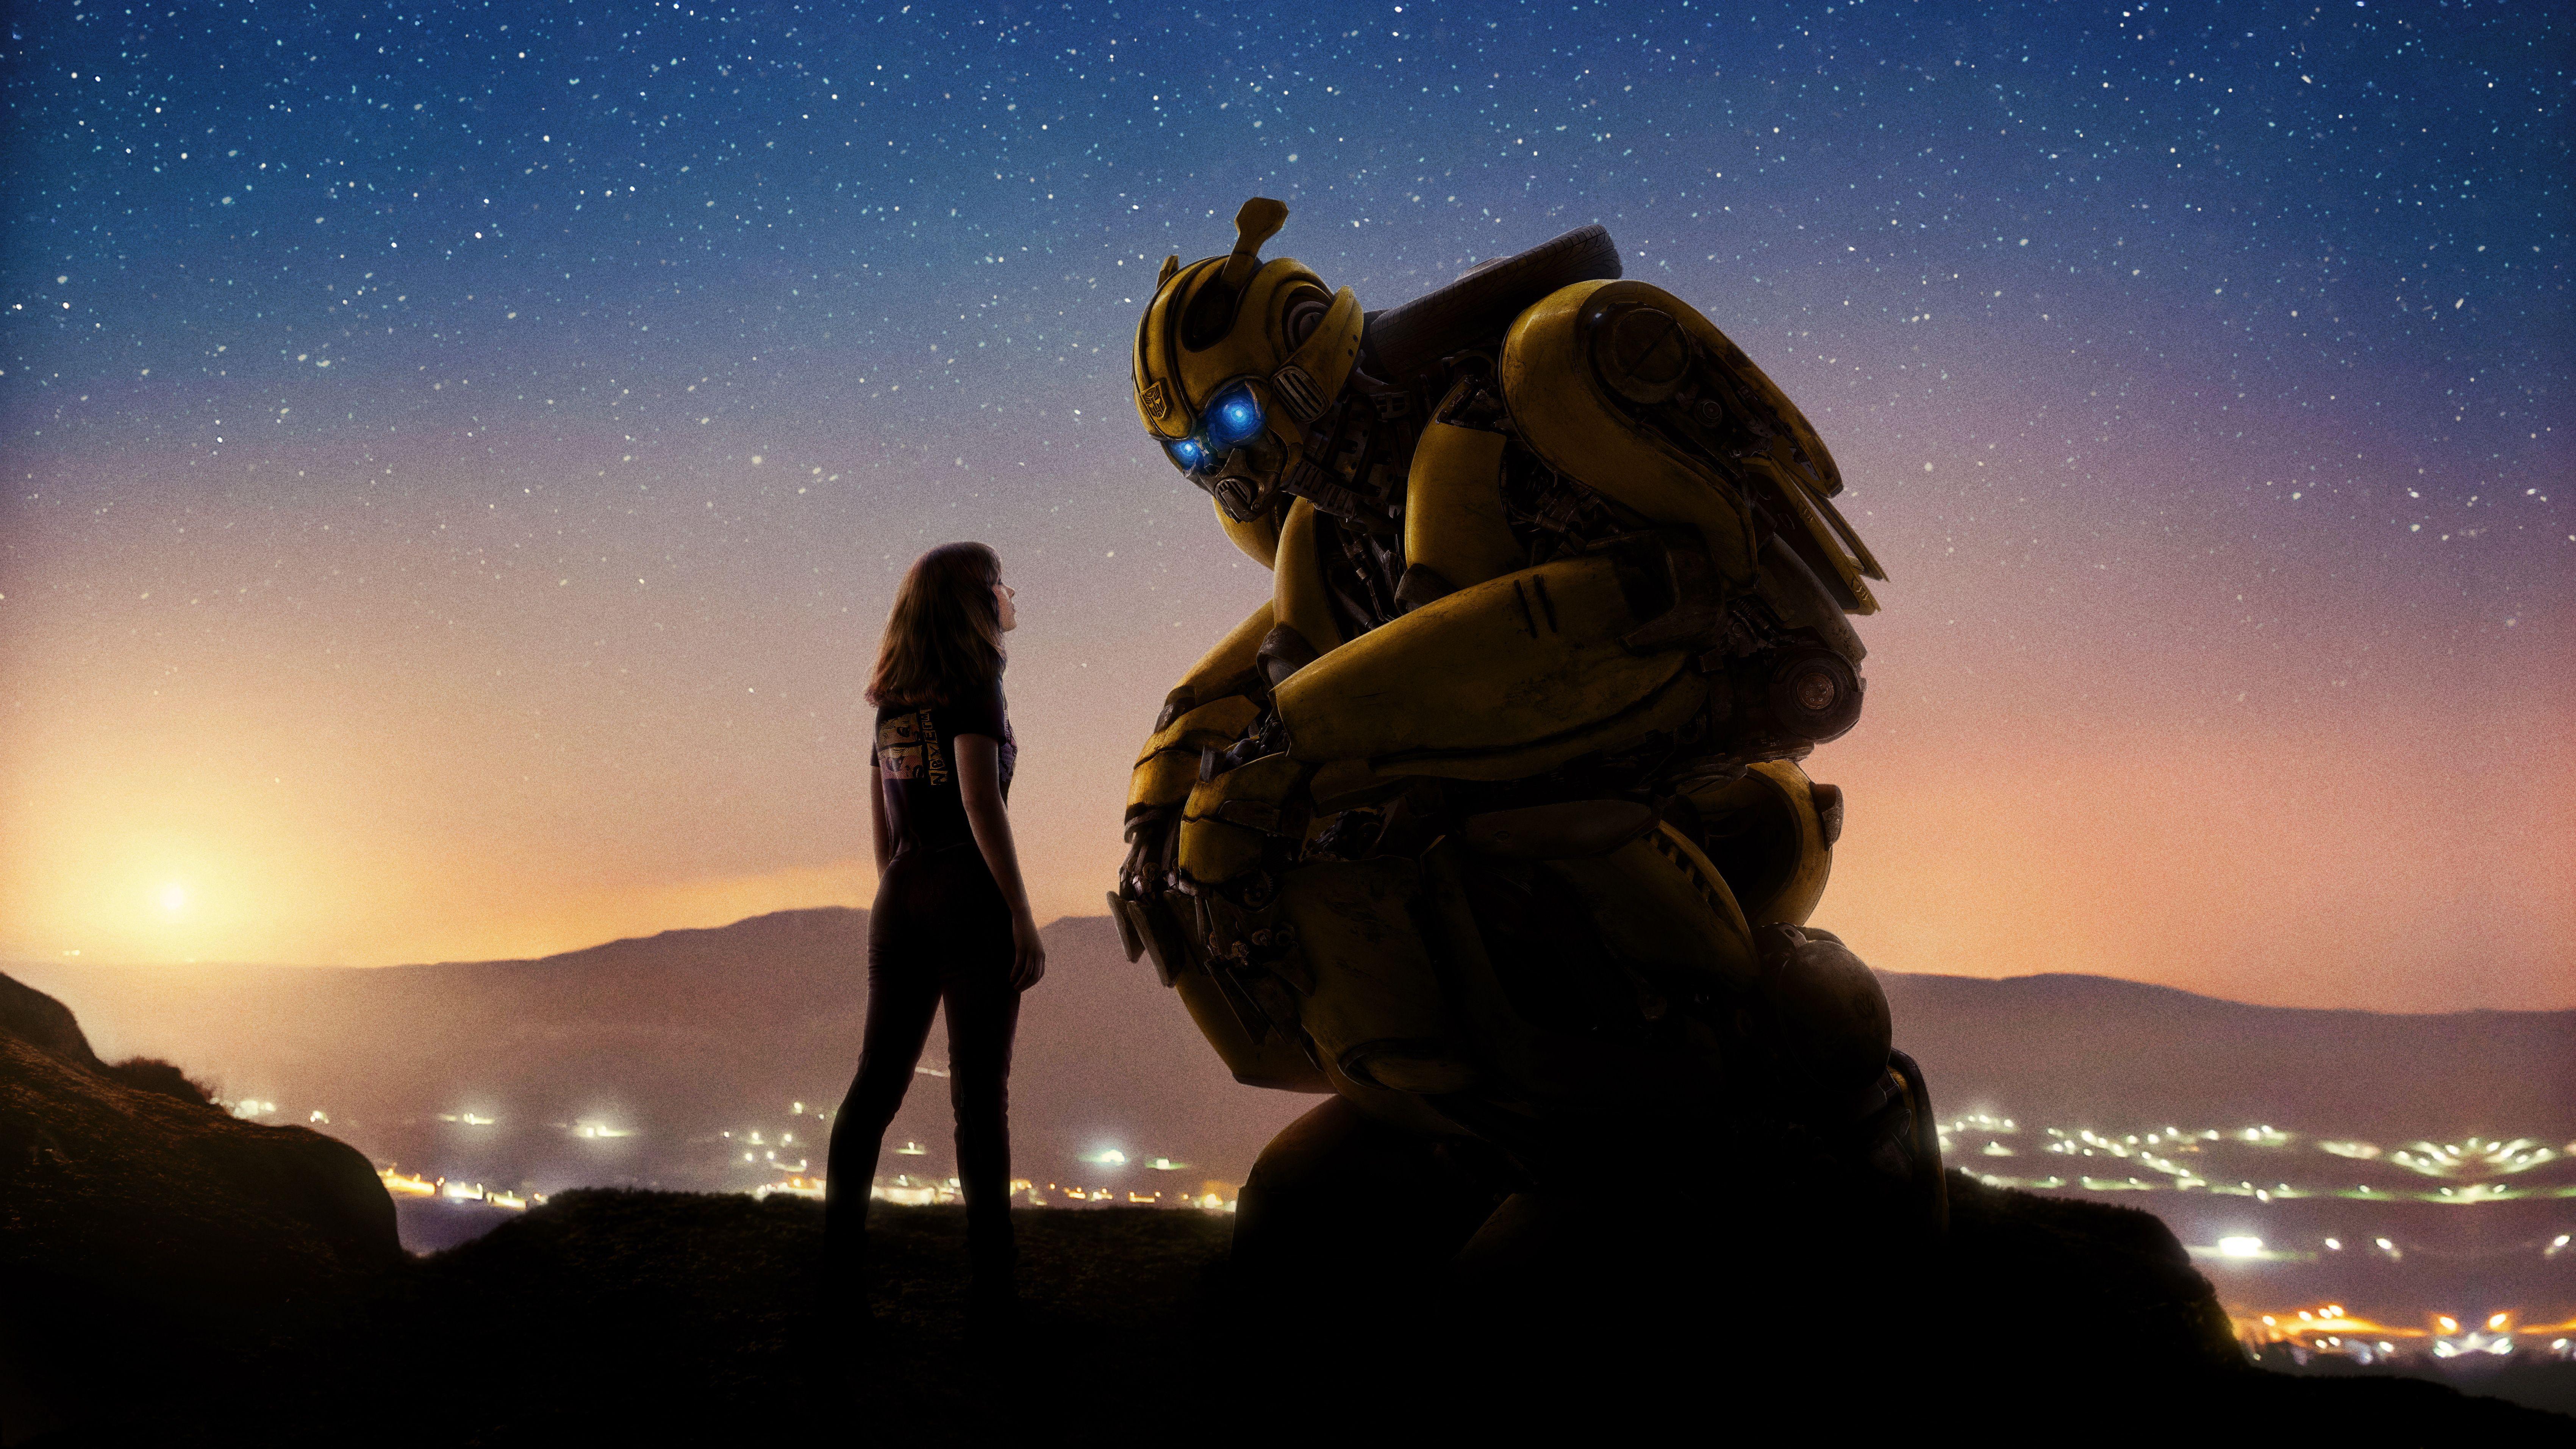 Bumblebee Movie 2018 Wallpapers Wallpaper Cave